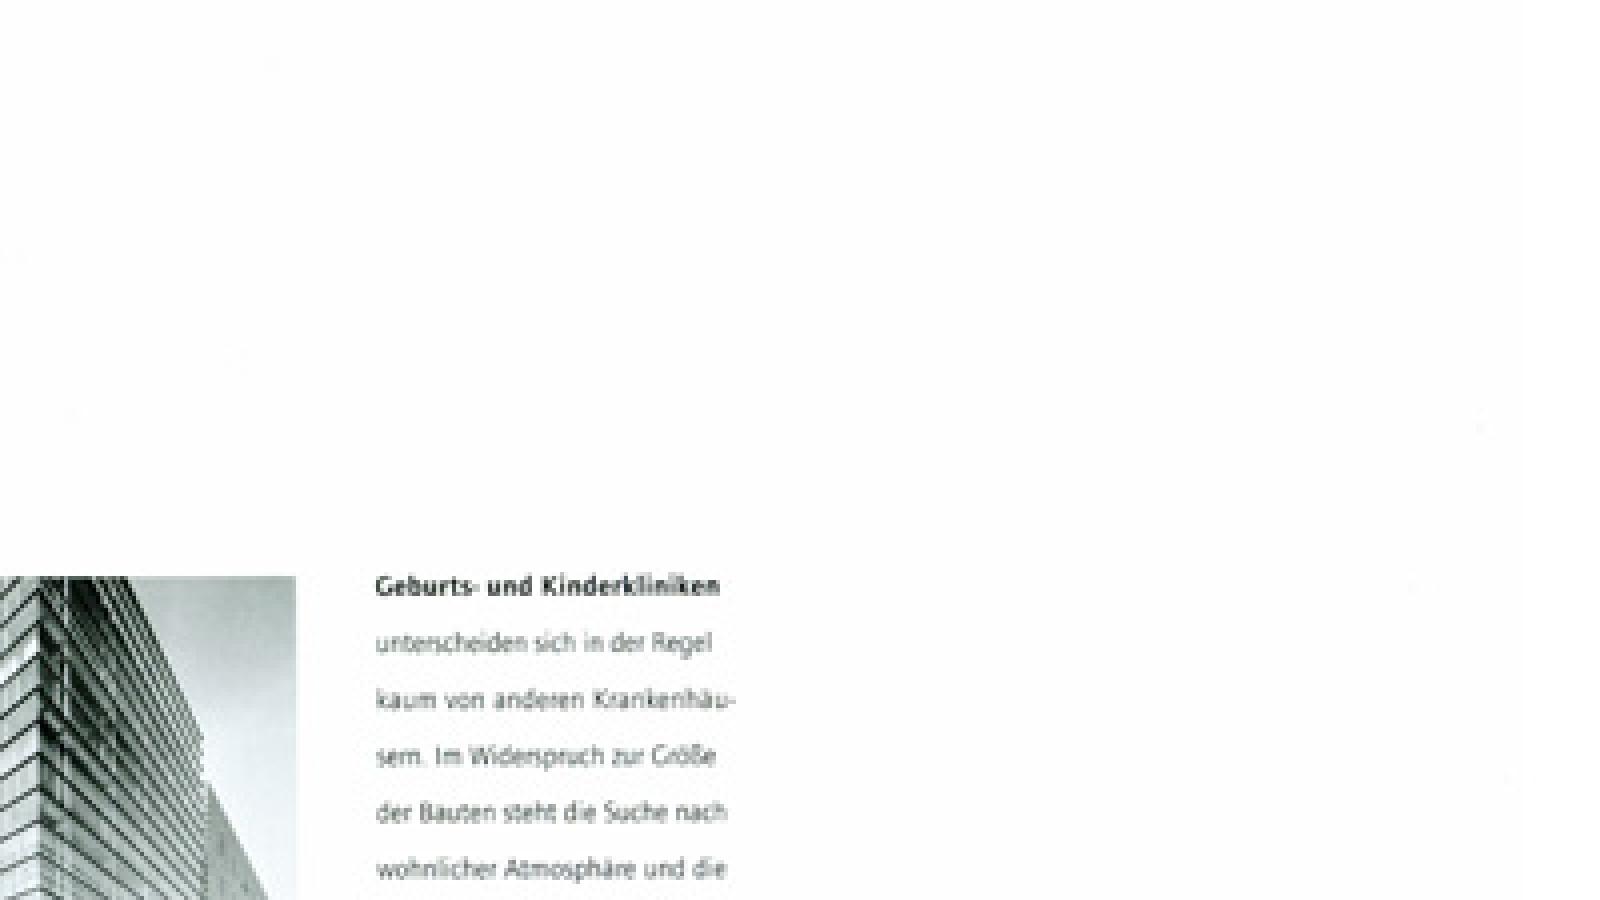 bauwelt_2004_033